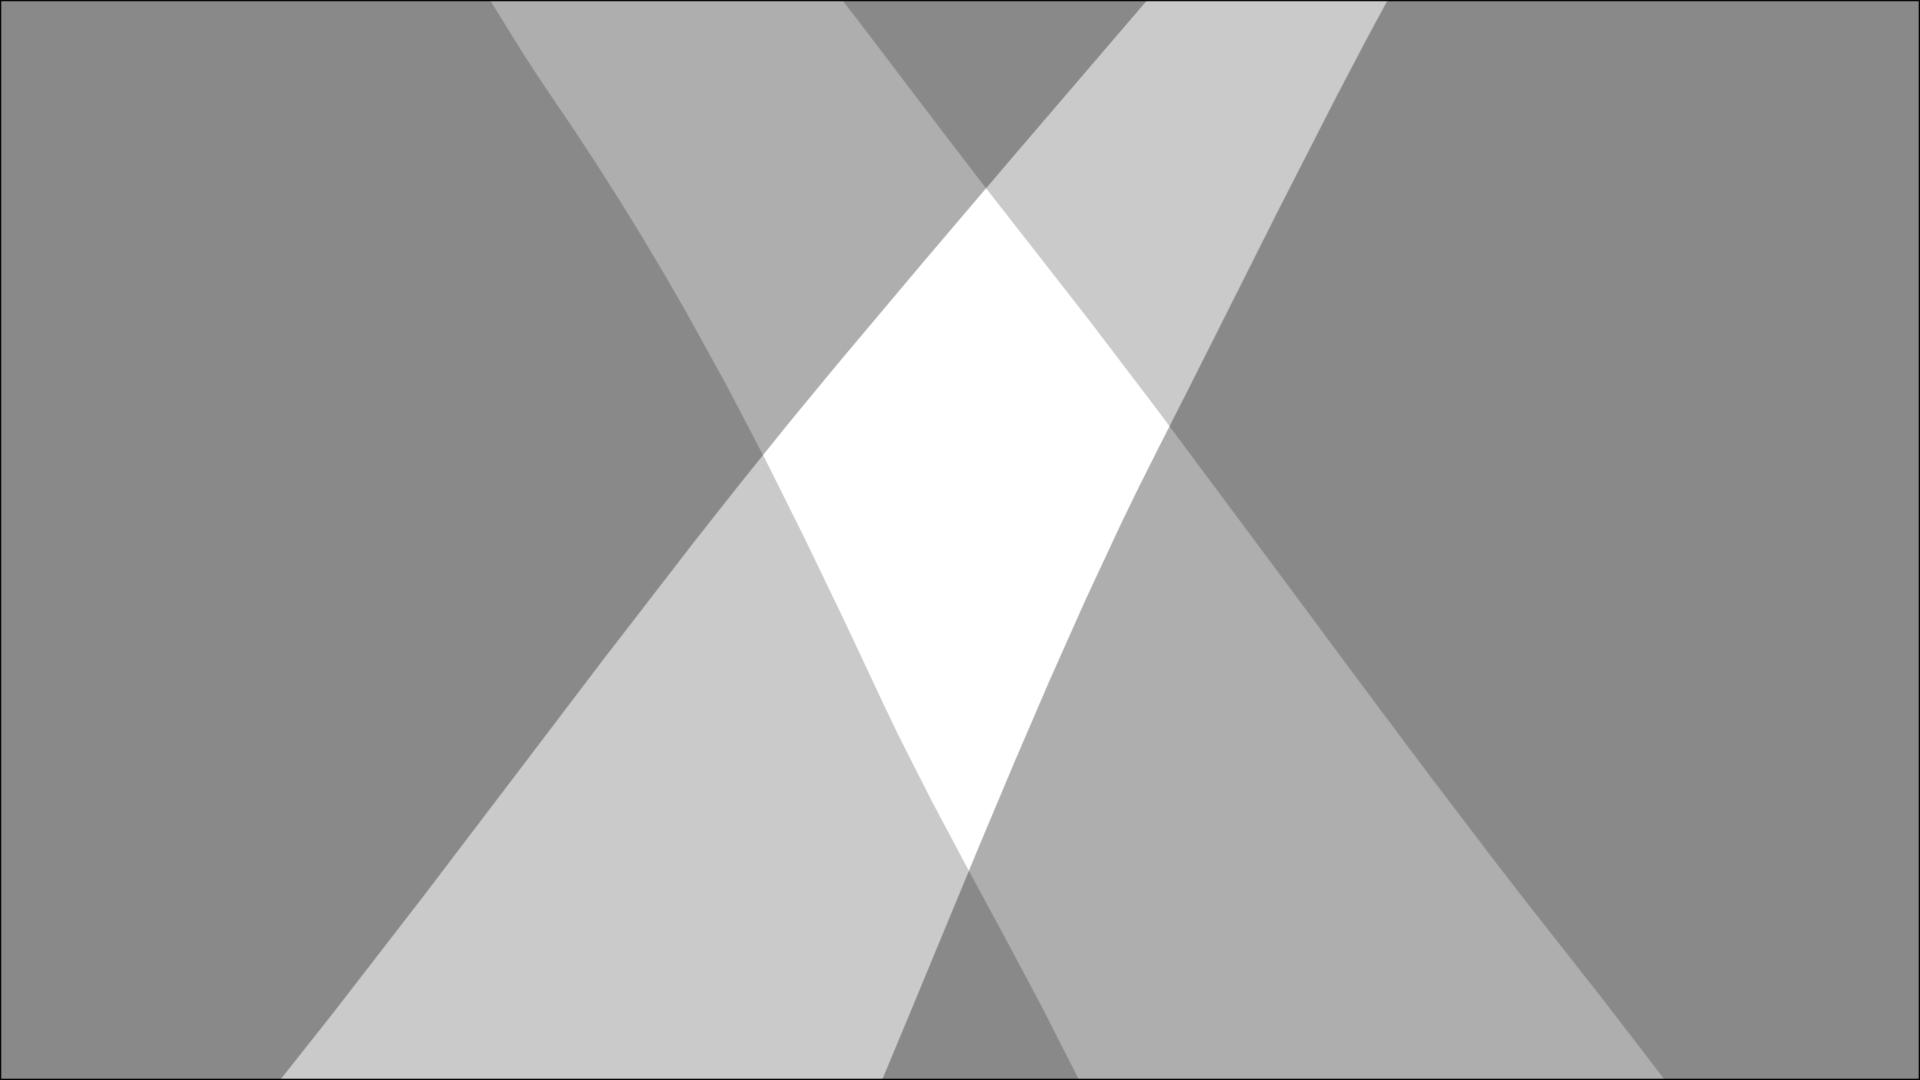 Blades of Furry-000001-01.jpg